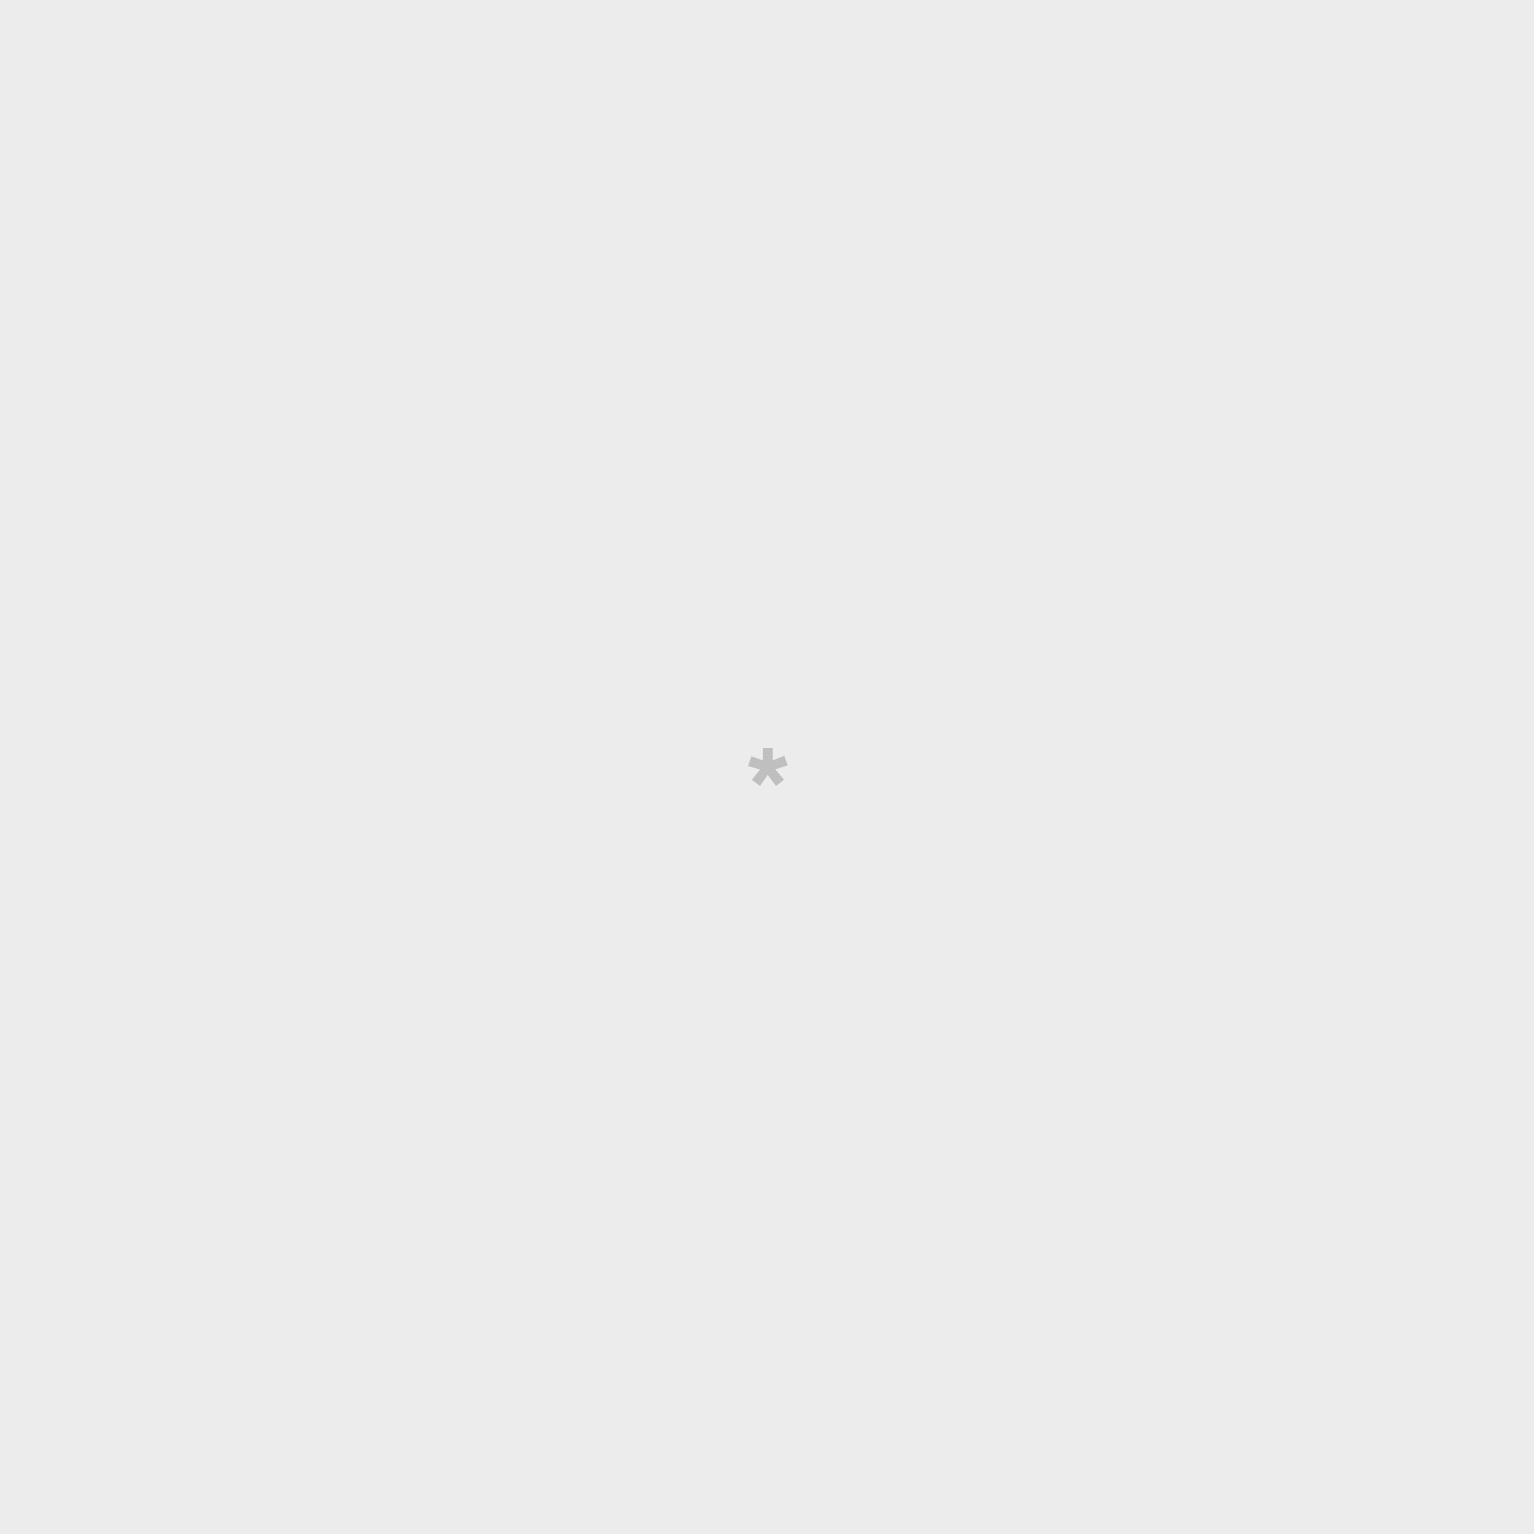 Socks one size - Avocados